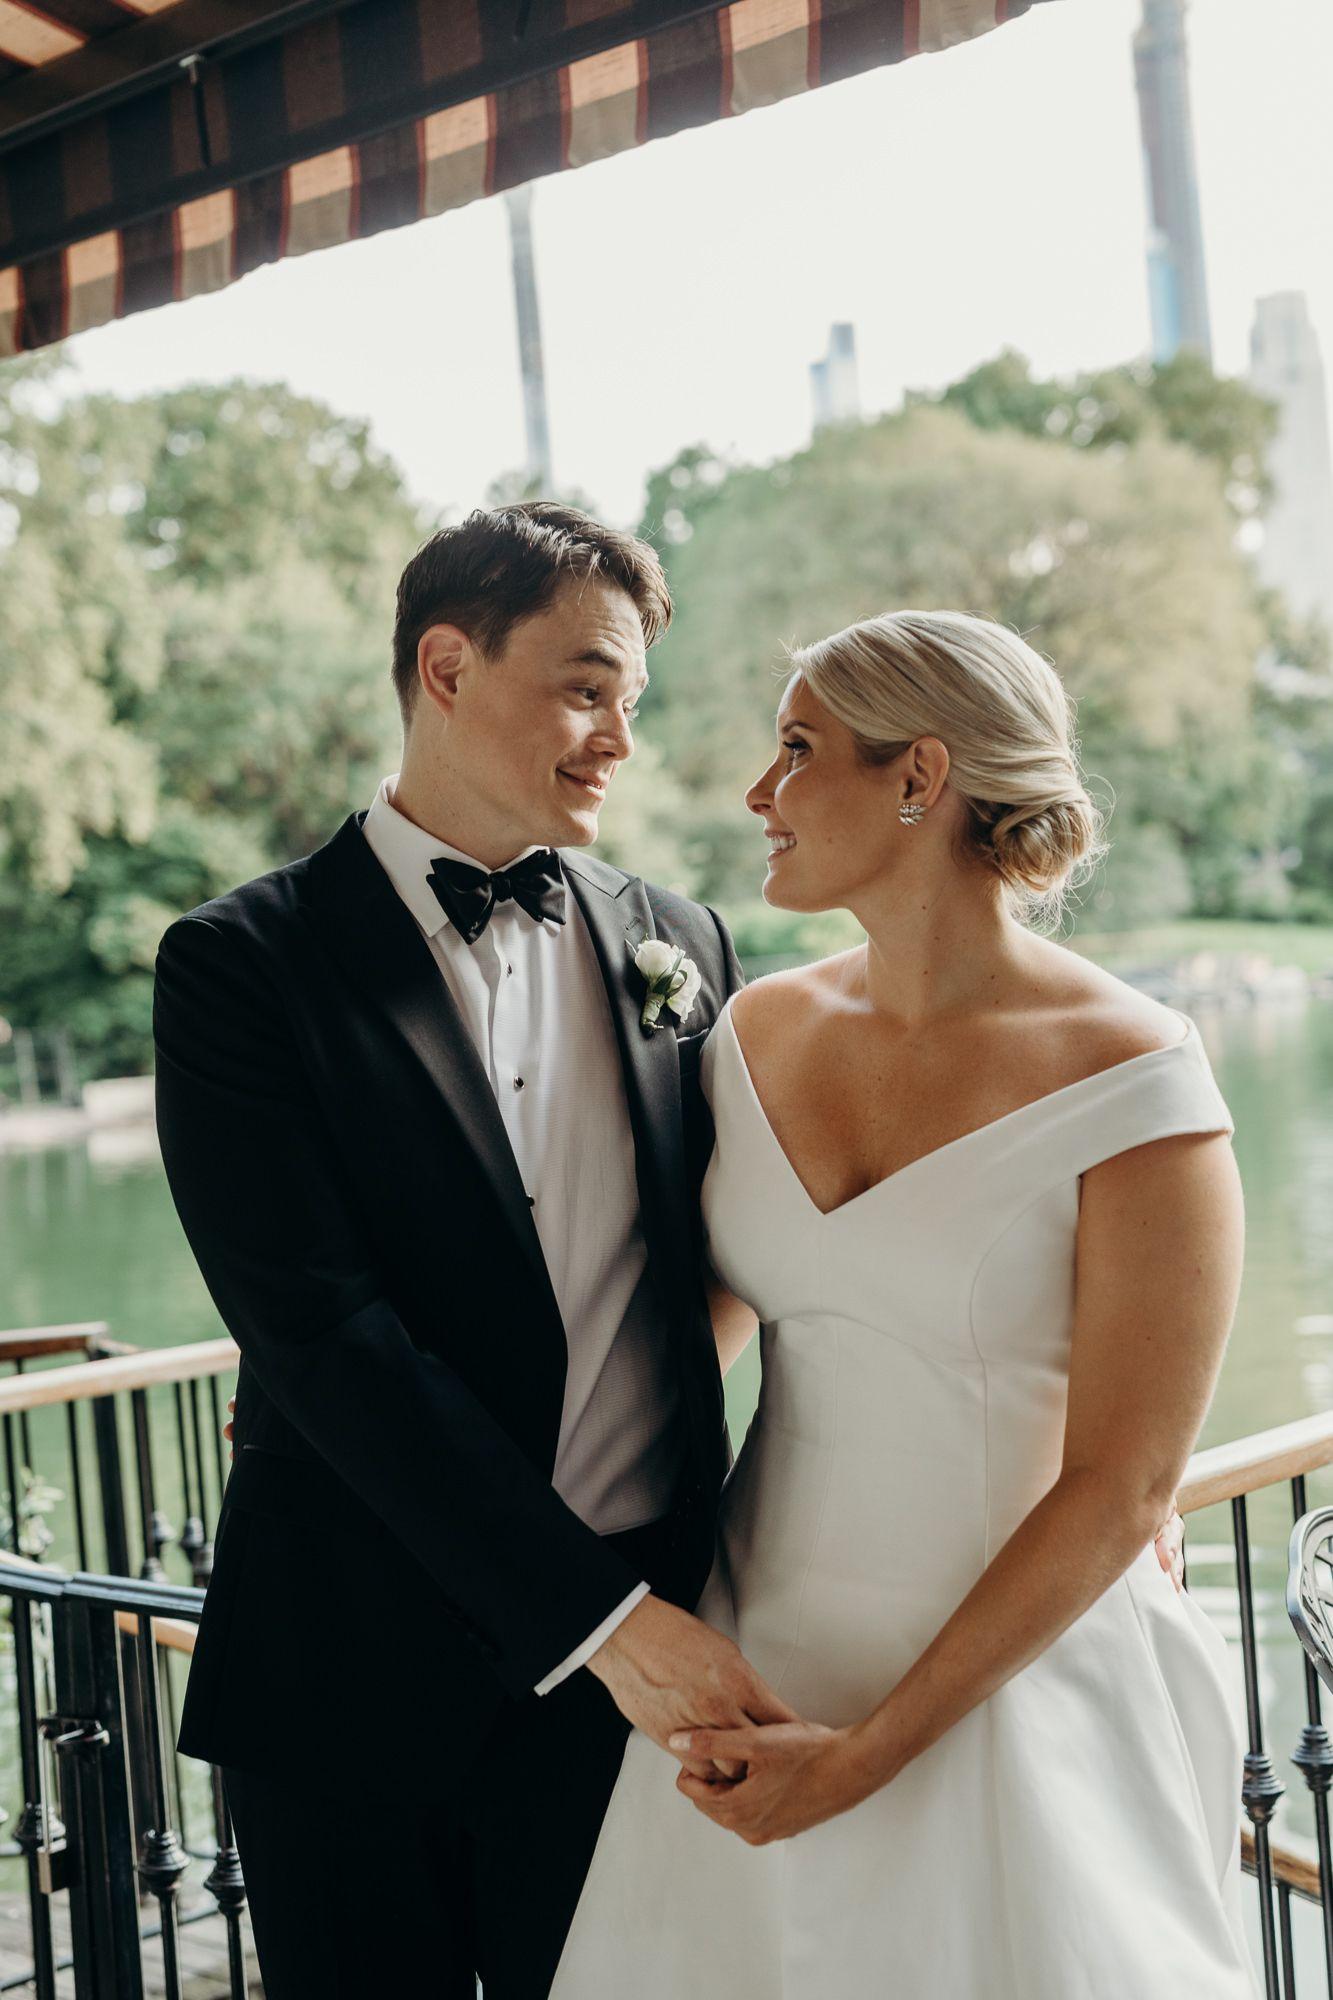 lauren + rick / the loeb boathouse, new york city wedding